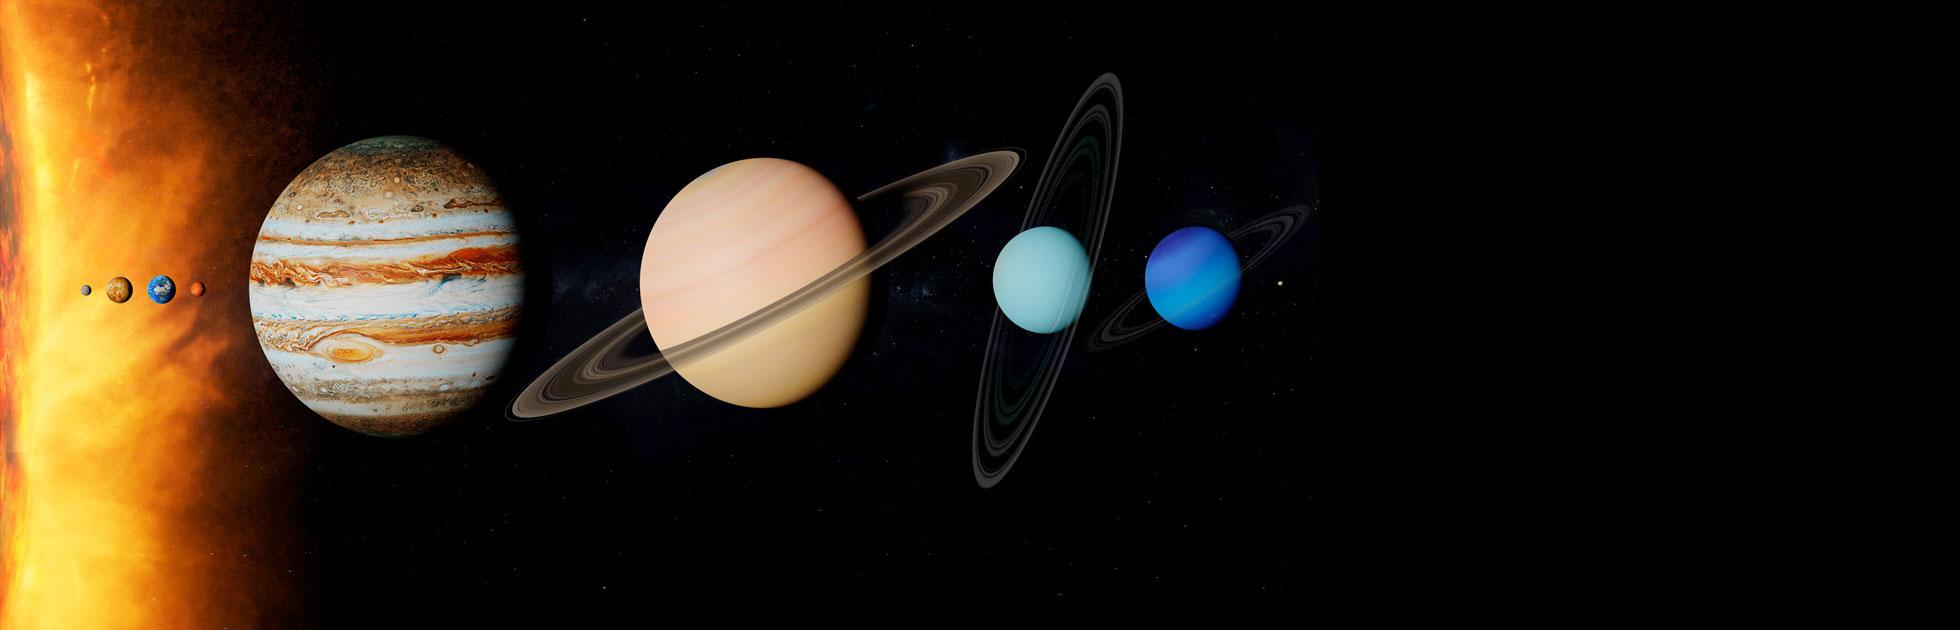 background-solar-system